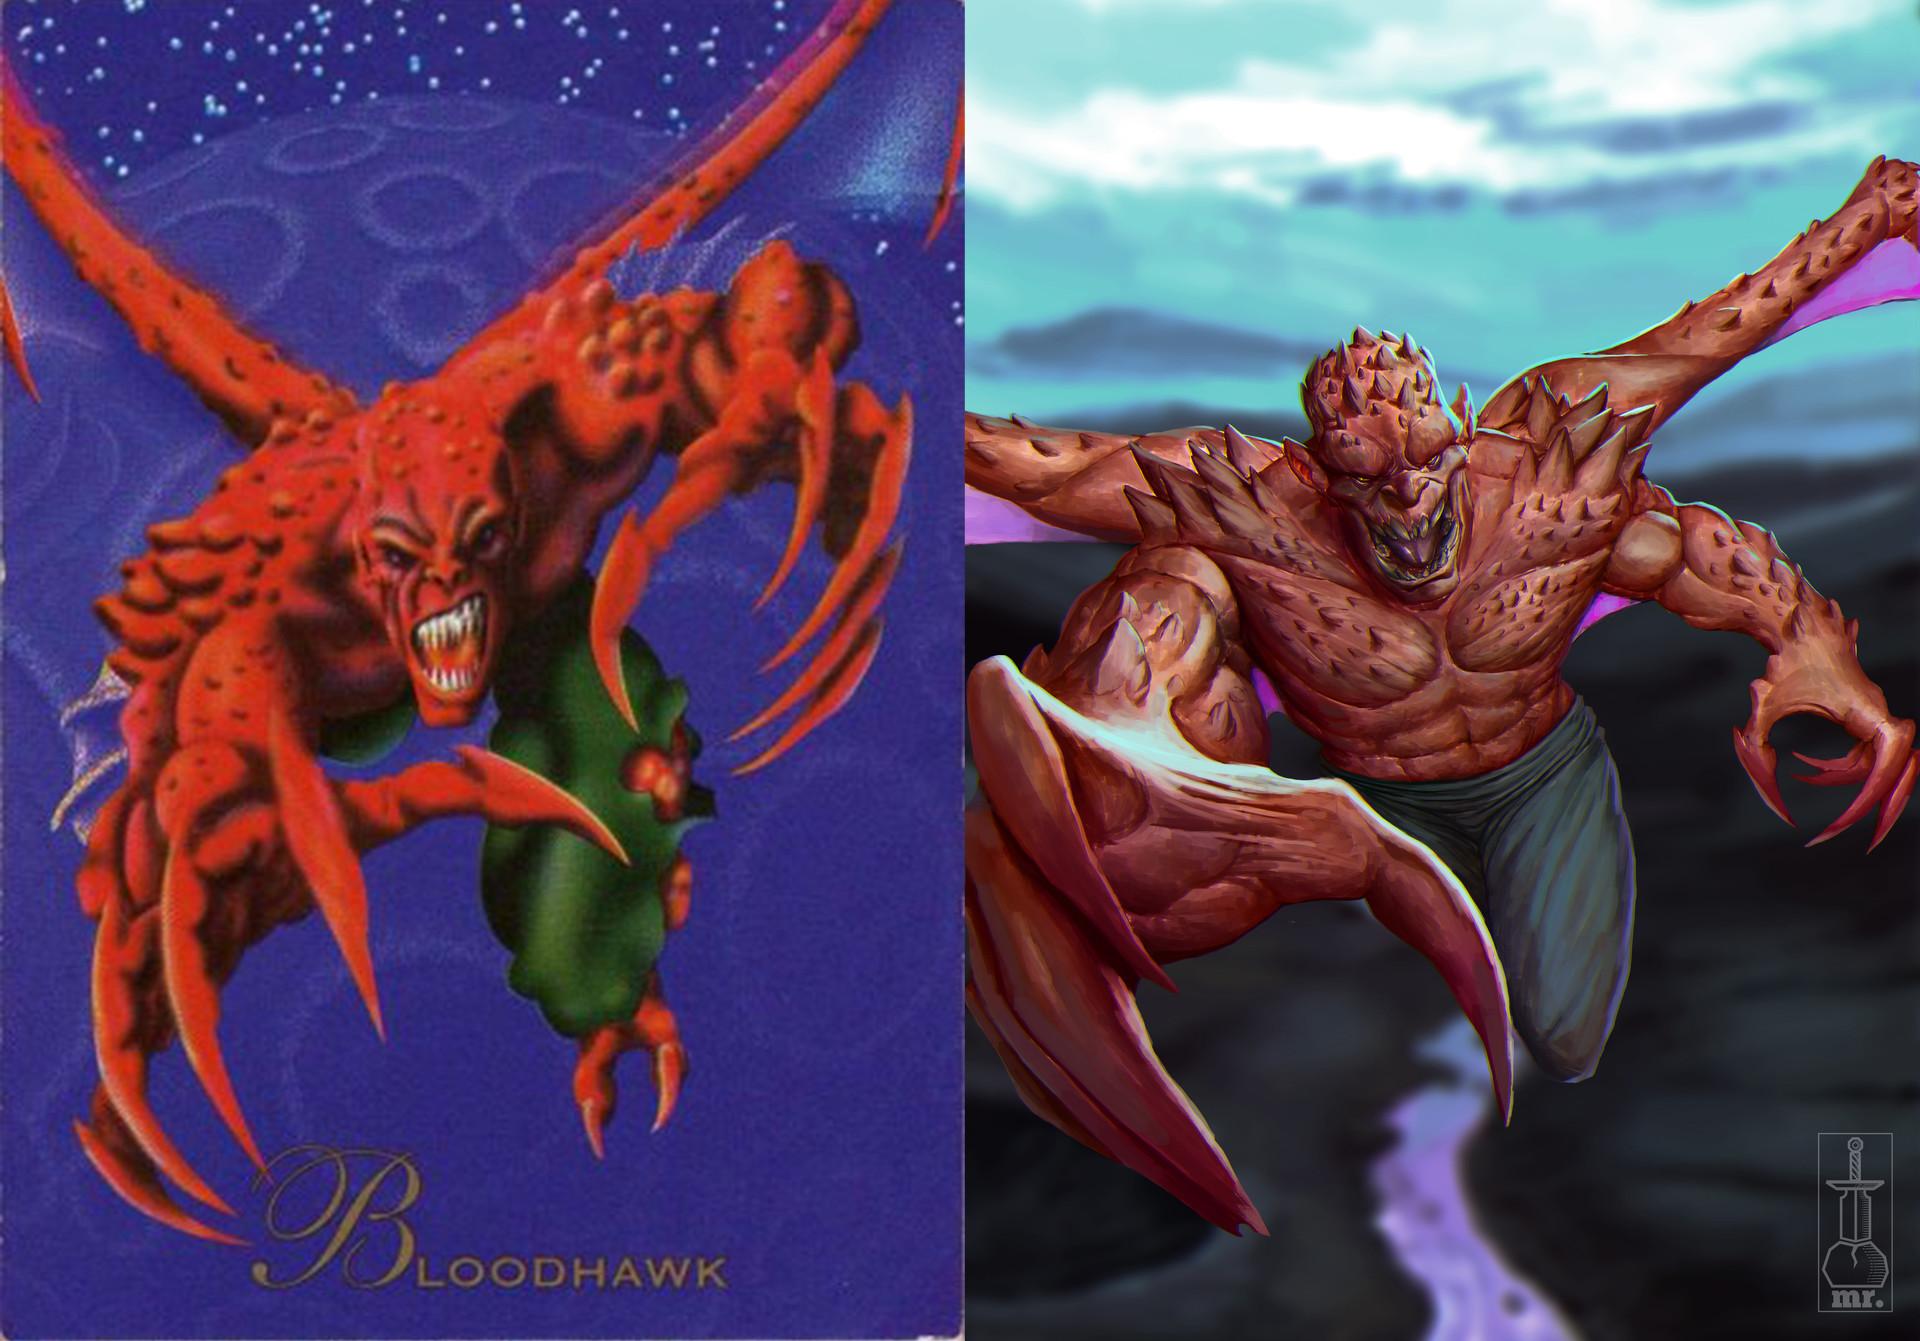 Juanda rico bloodhawk comparation